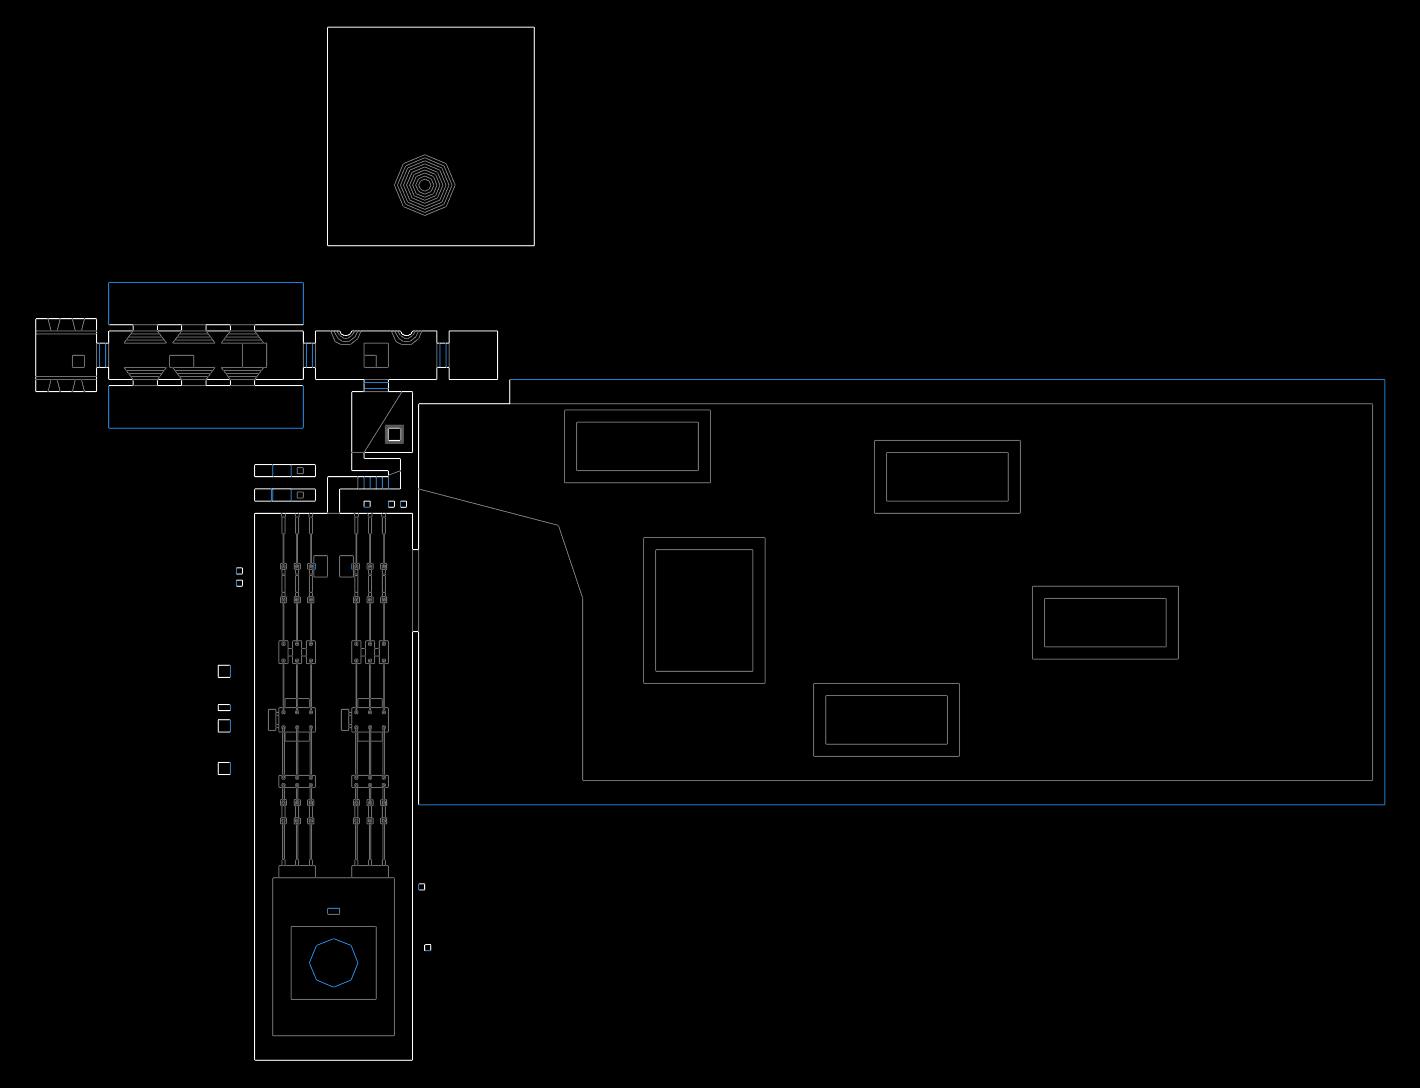 MAP02.png.fa94e6b6eedda7d20a6d1cff2a3e4258.png